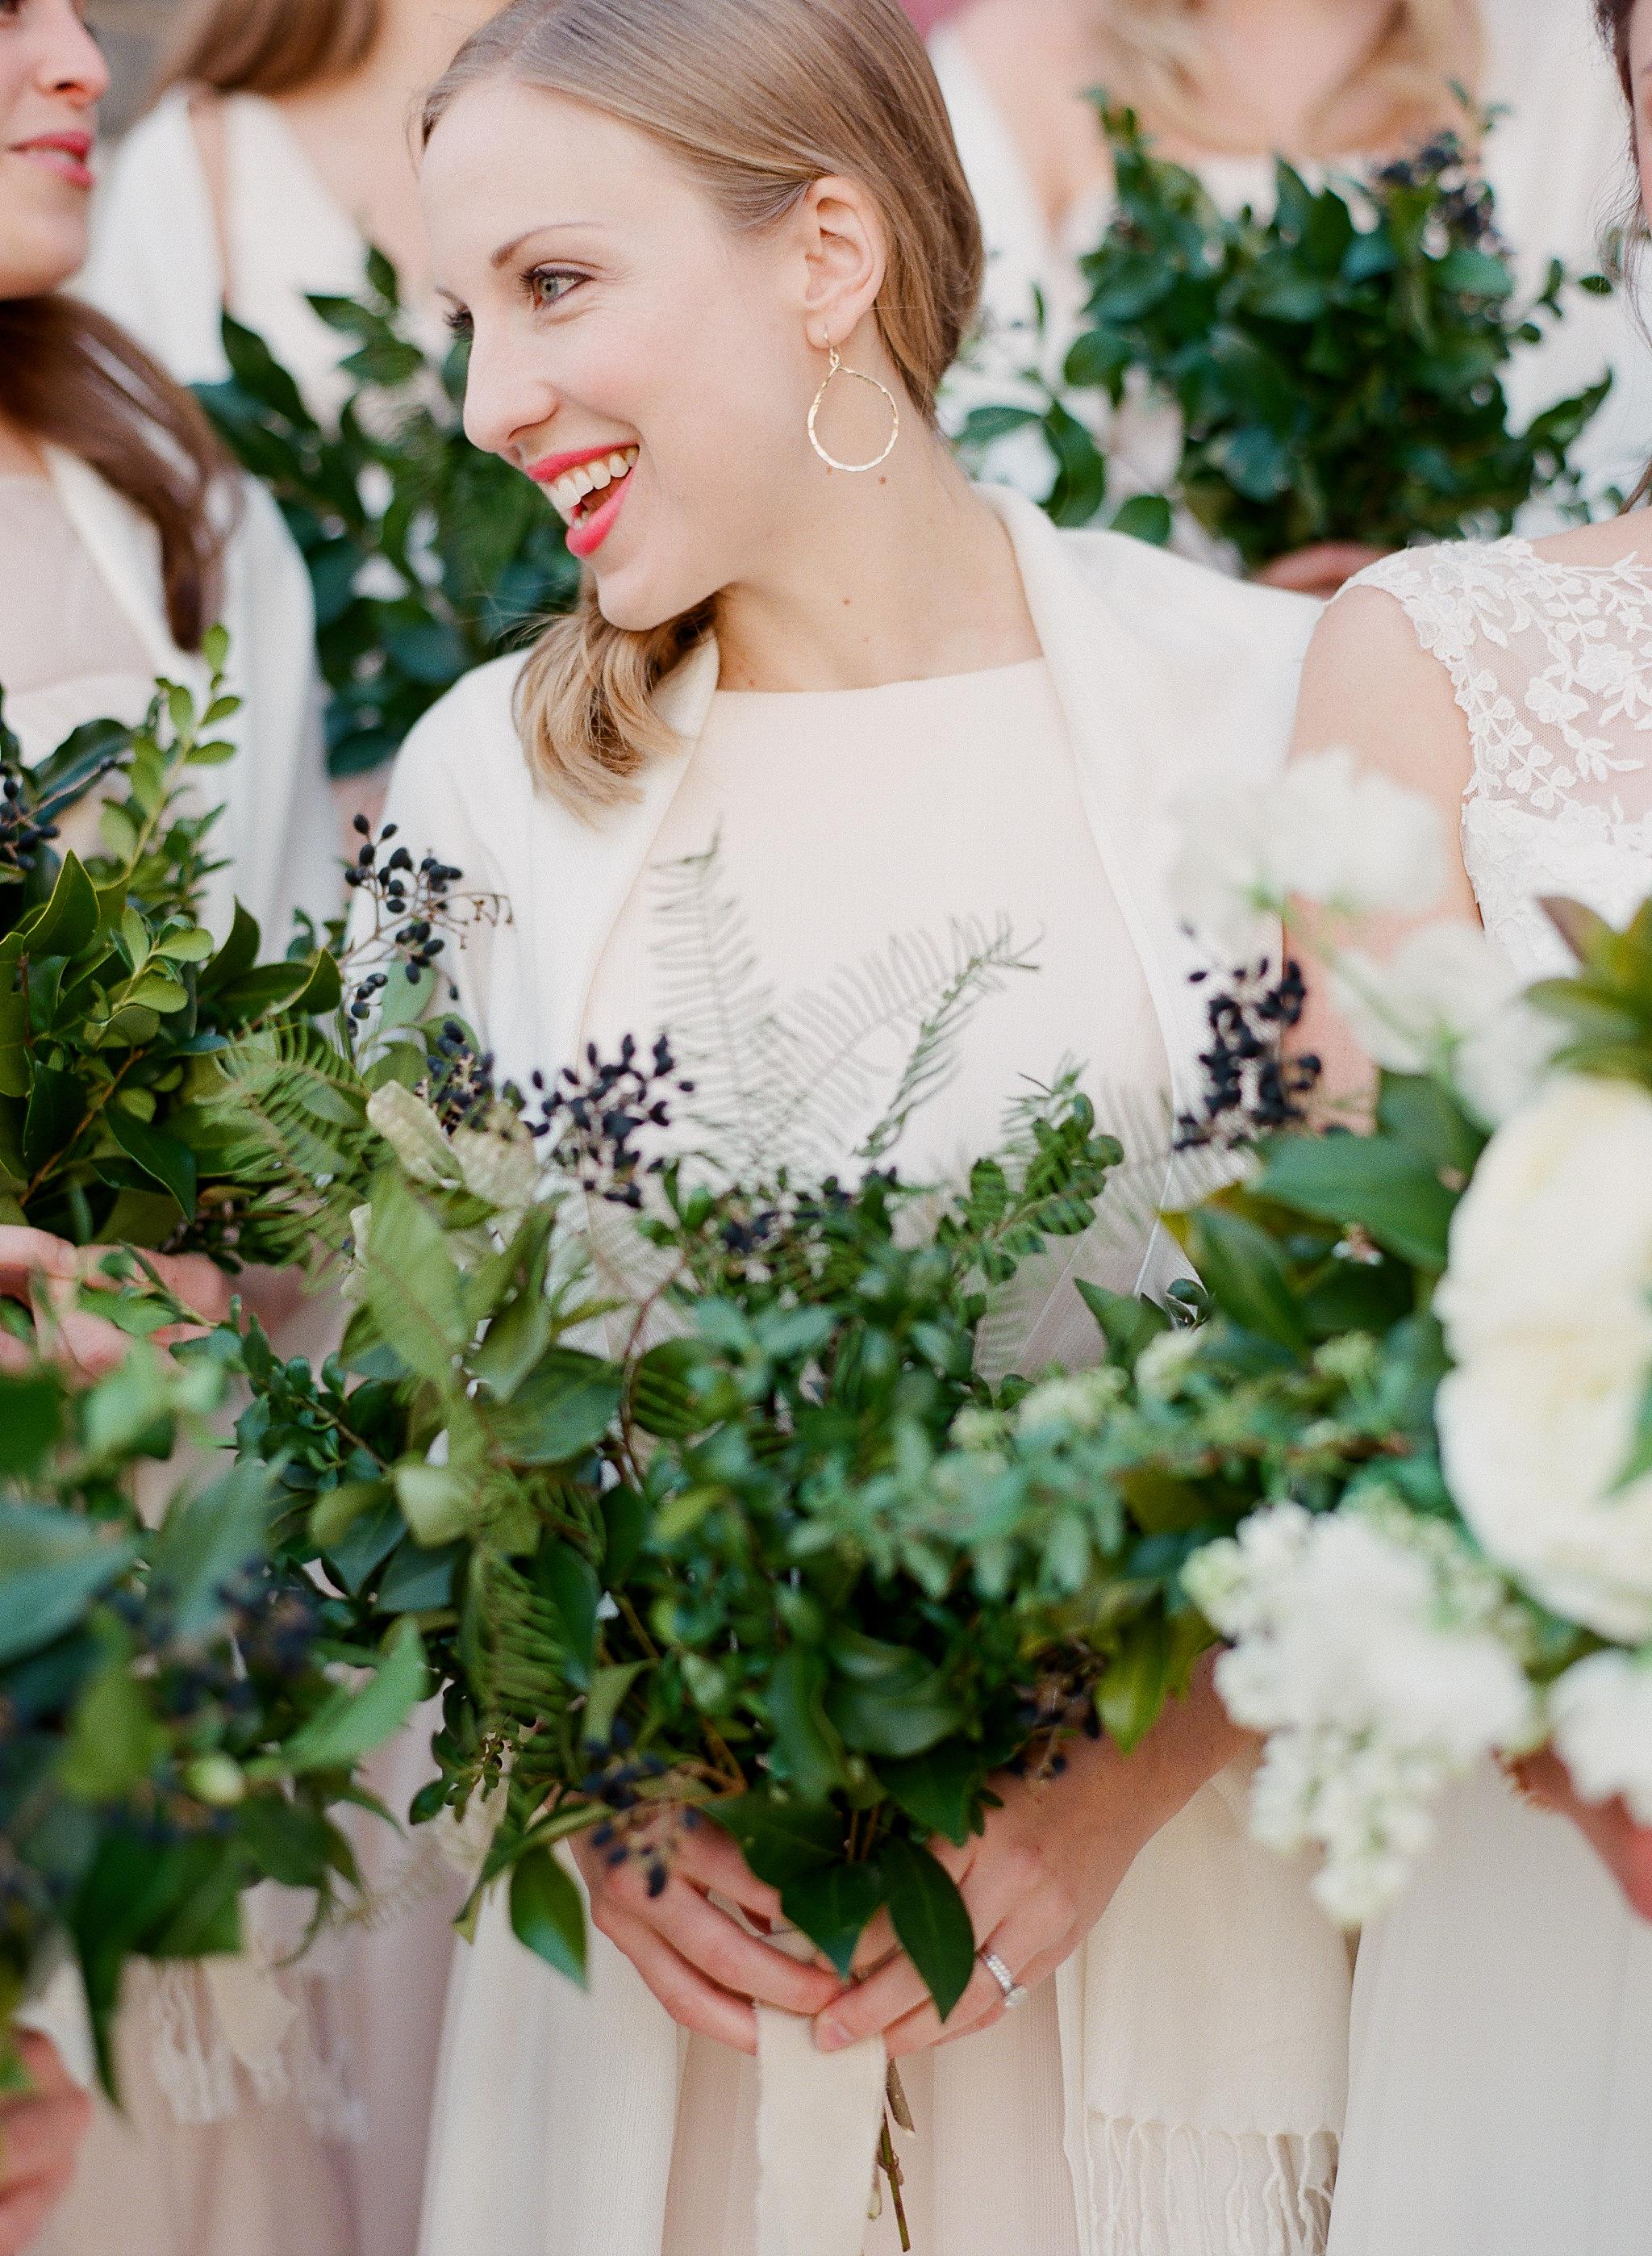 20150214_DownsRomano_wedding_0082_0082.jpg